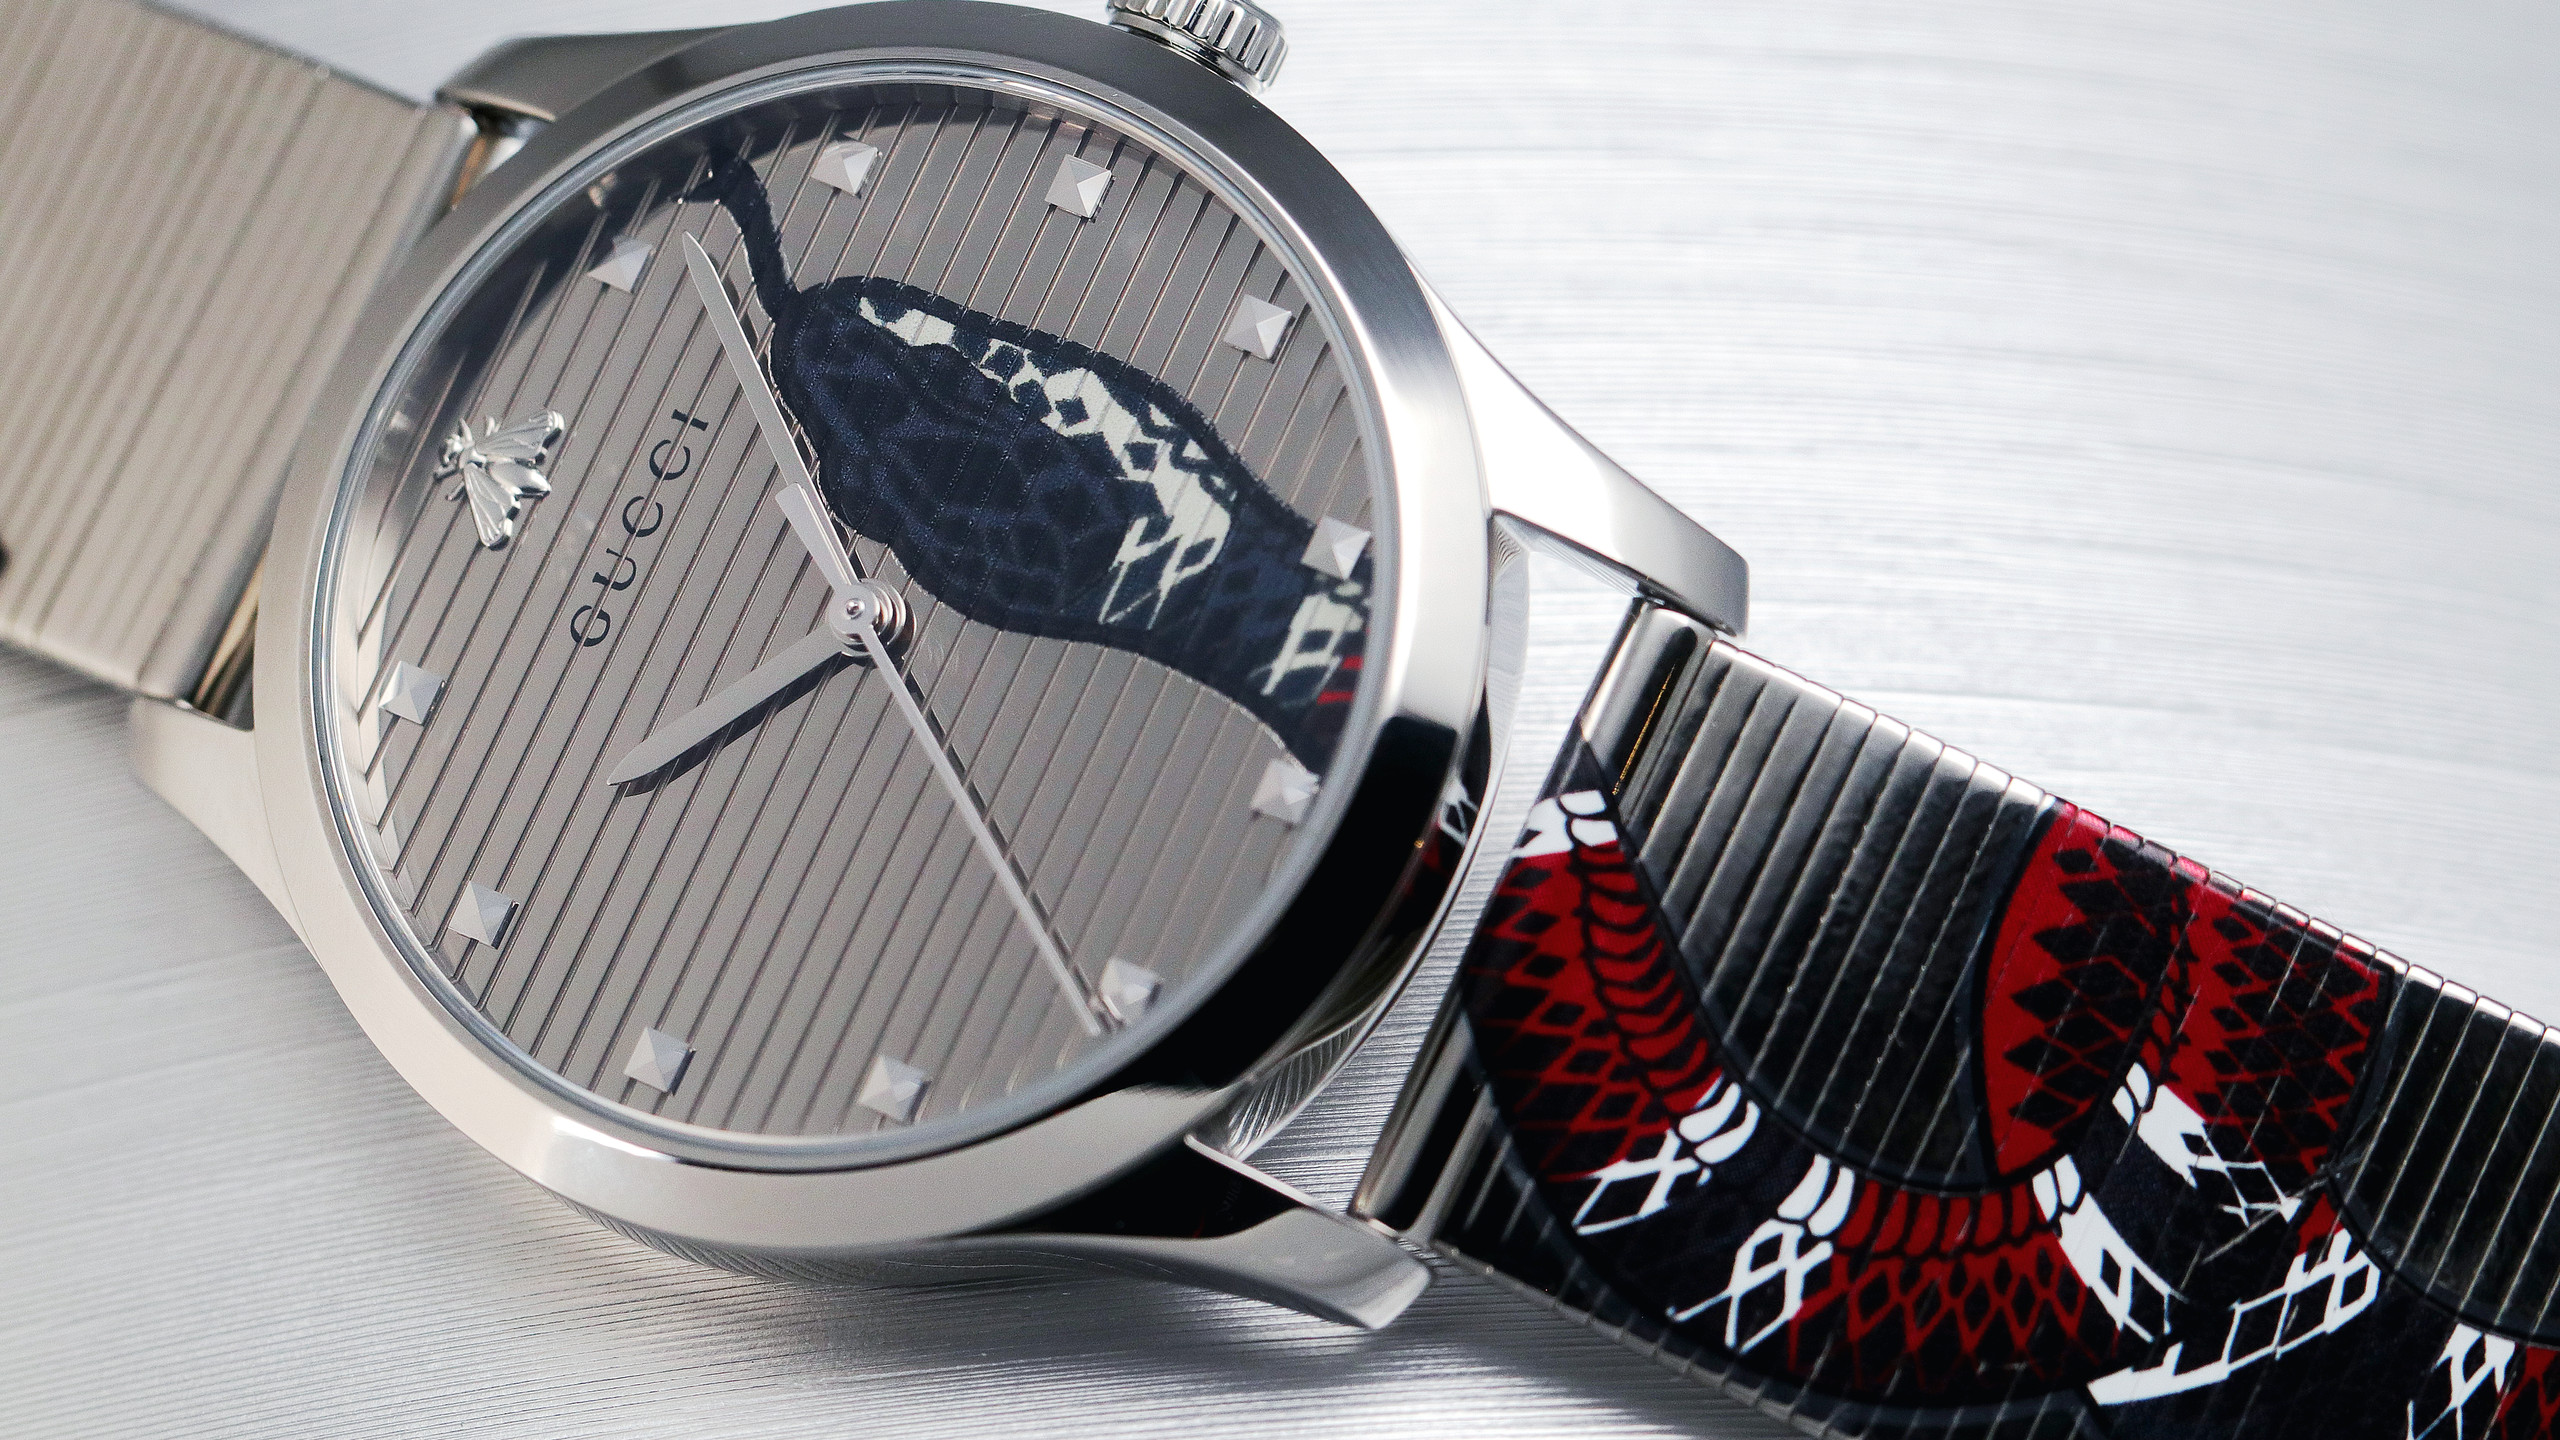 G-Timeless當代腕錶—— 帝王蛇圖案